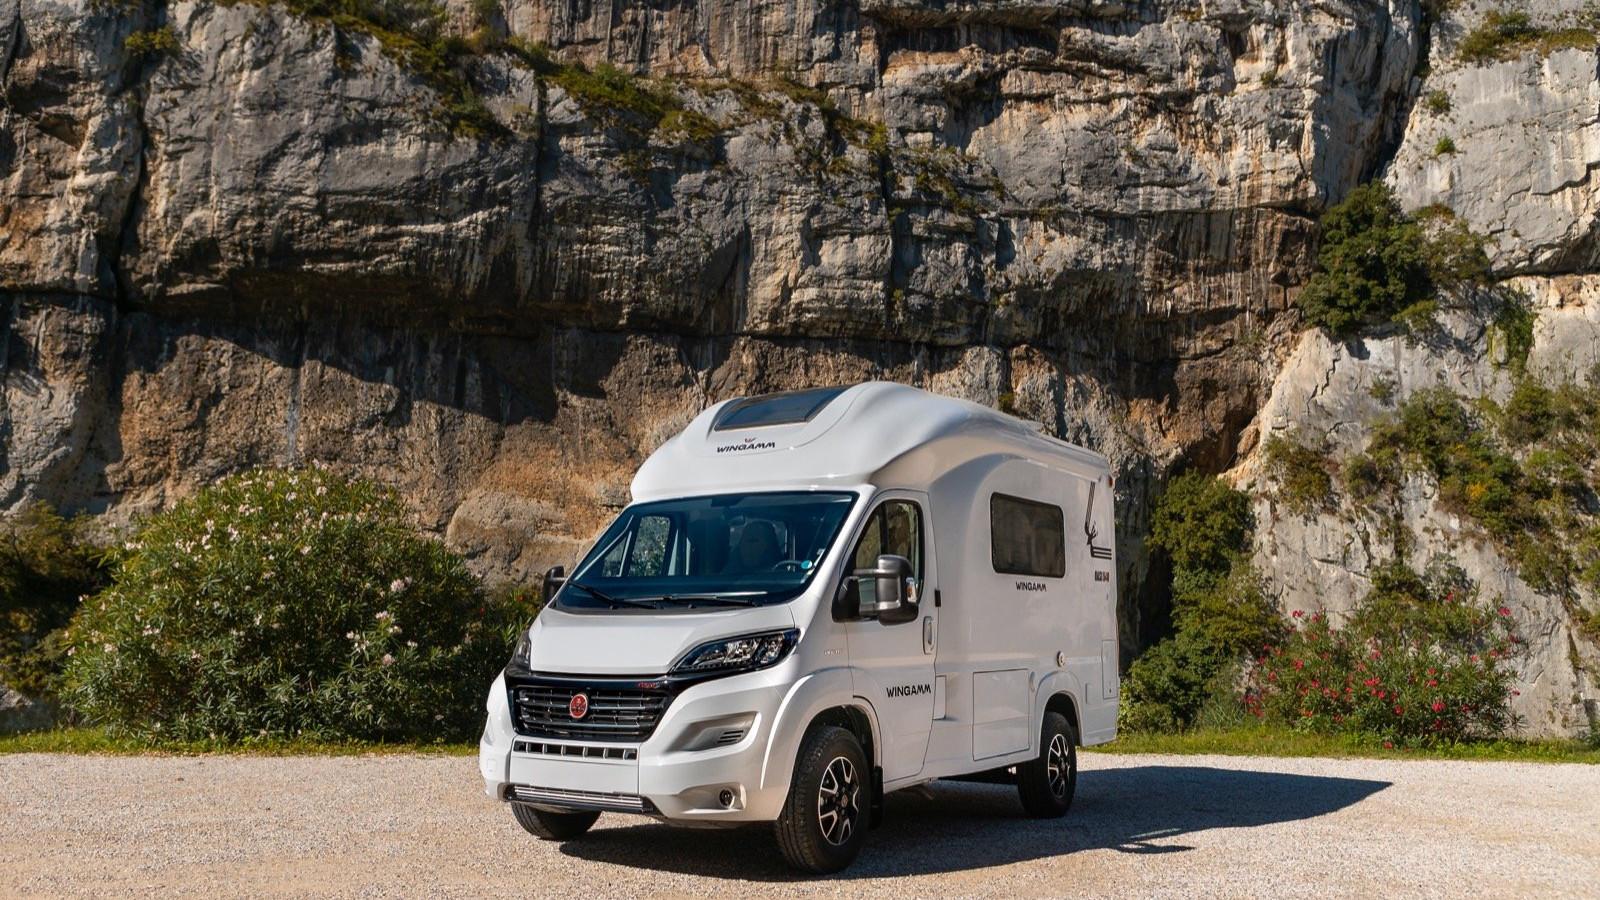 Oasi 540 petit camping-car de luxe camping-car de moins de 5 6 m premium - camping-car